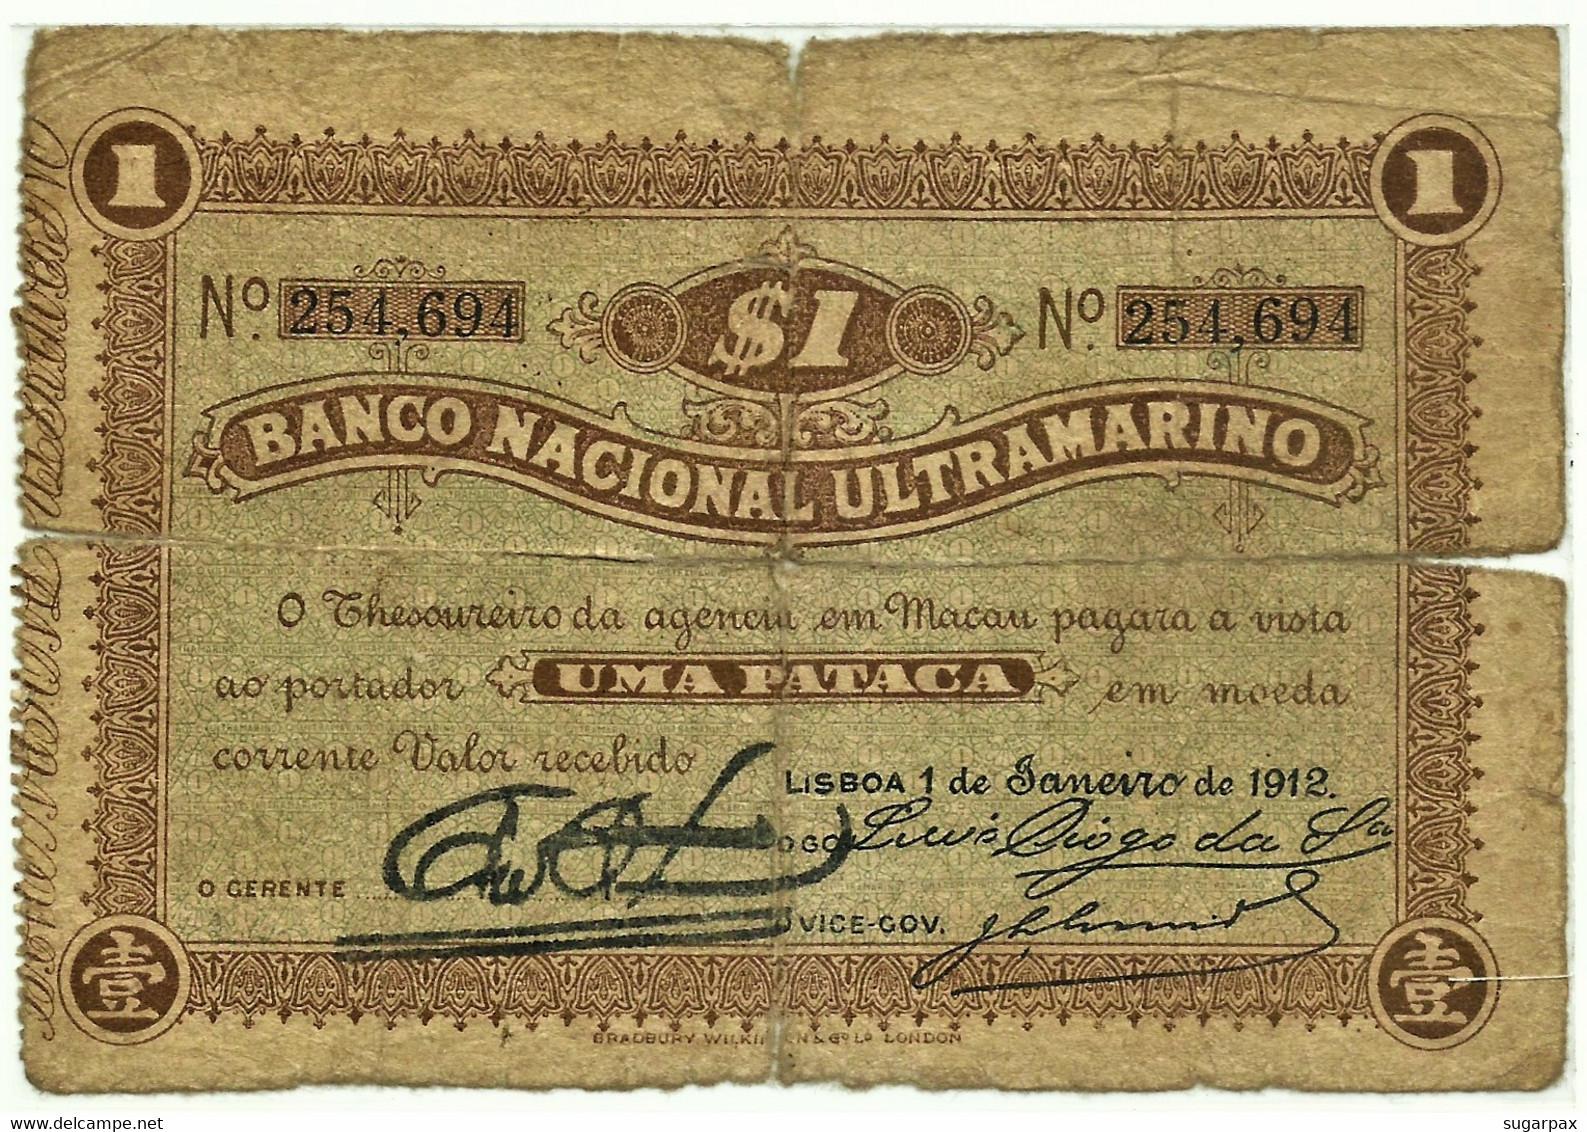 MACAU - 1 Pataca - 01.01.1912 - Pick 7 - Very Very RARE - PORTUGAL - Macau